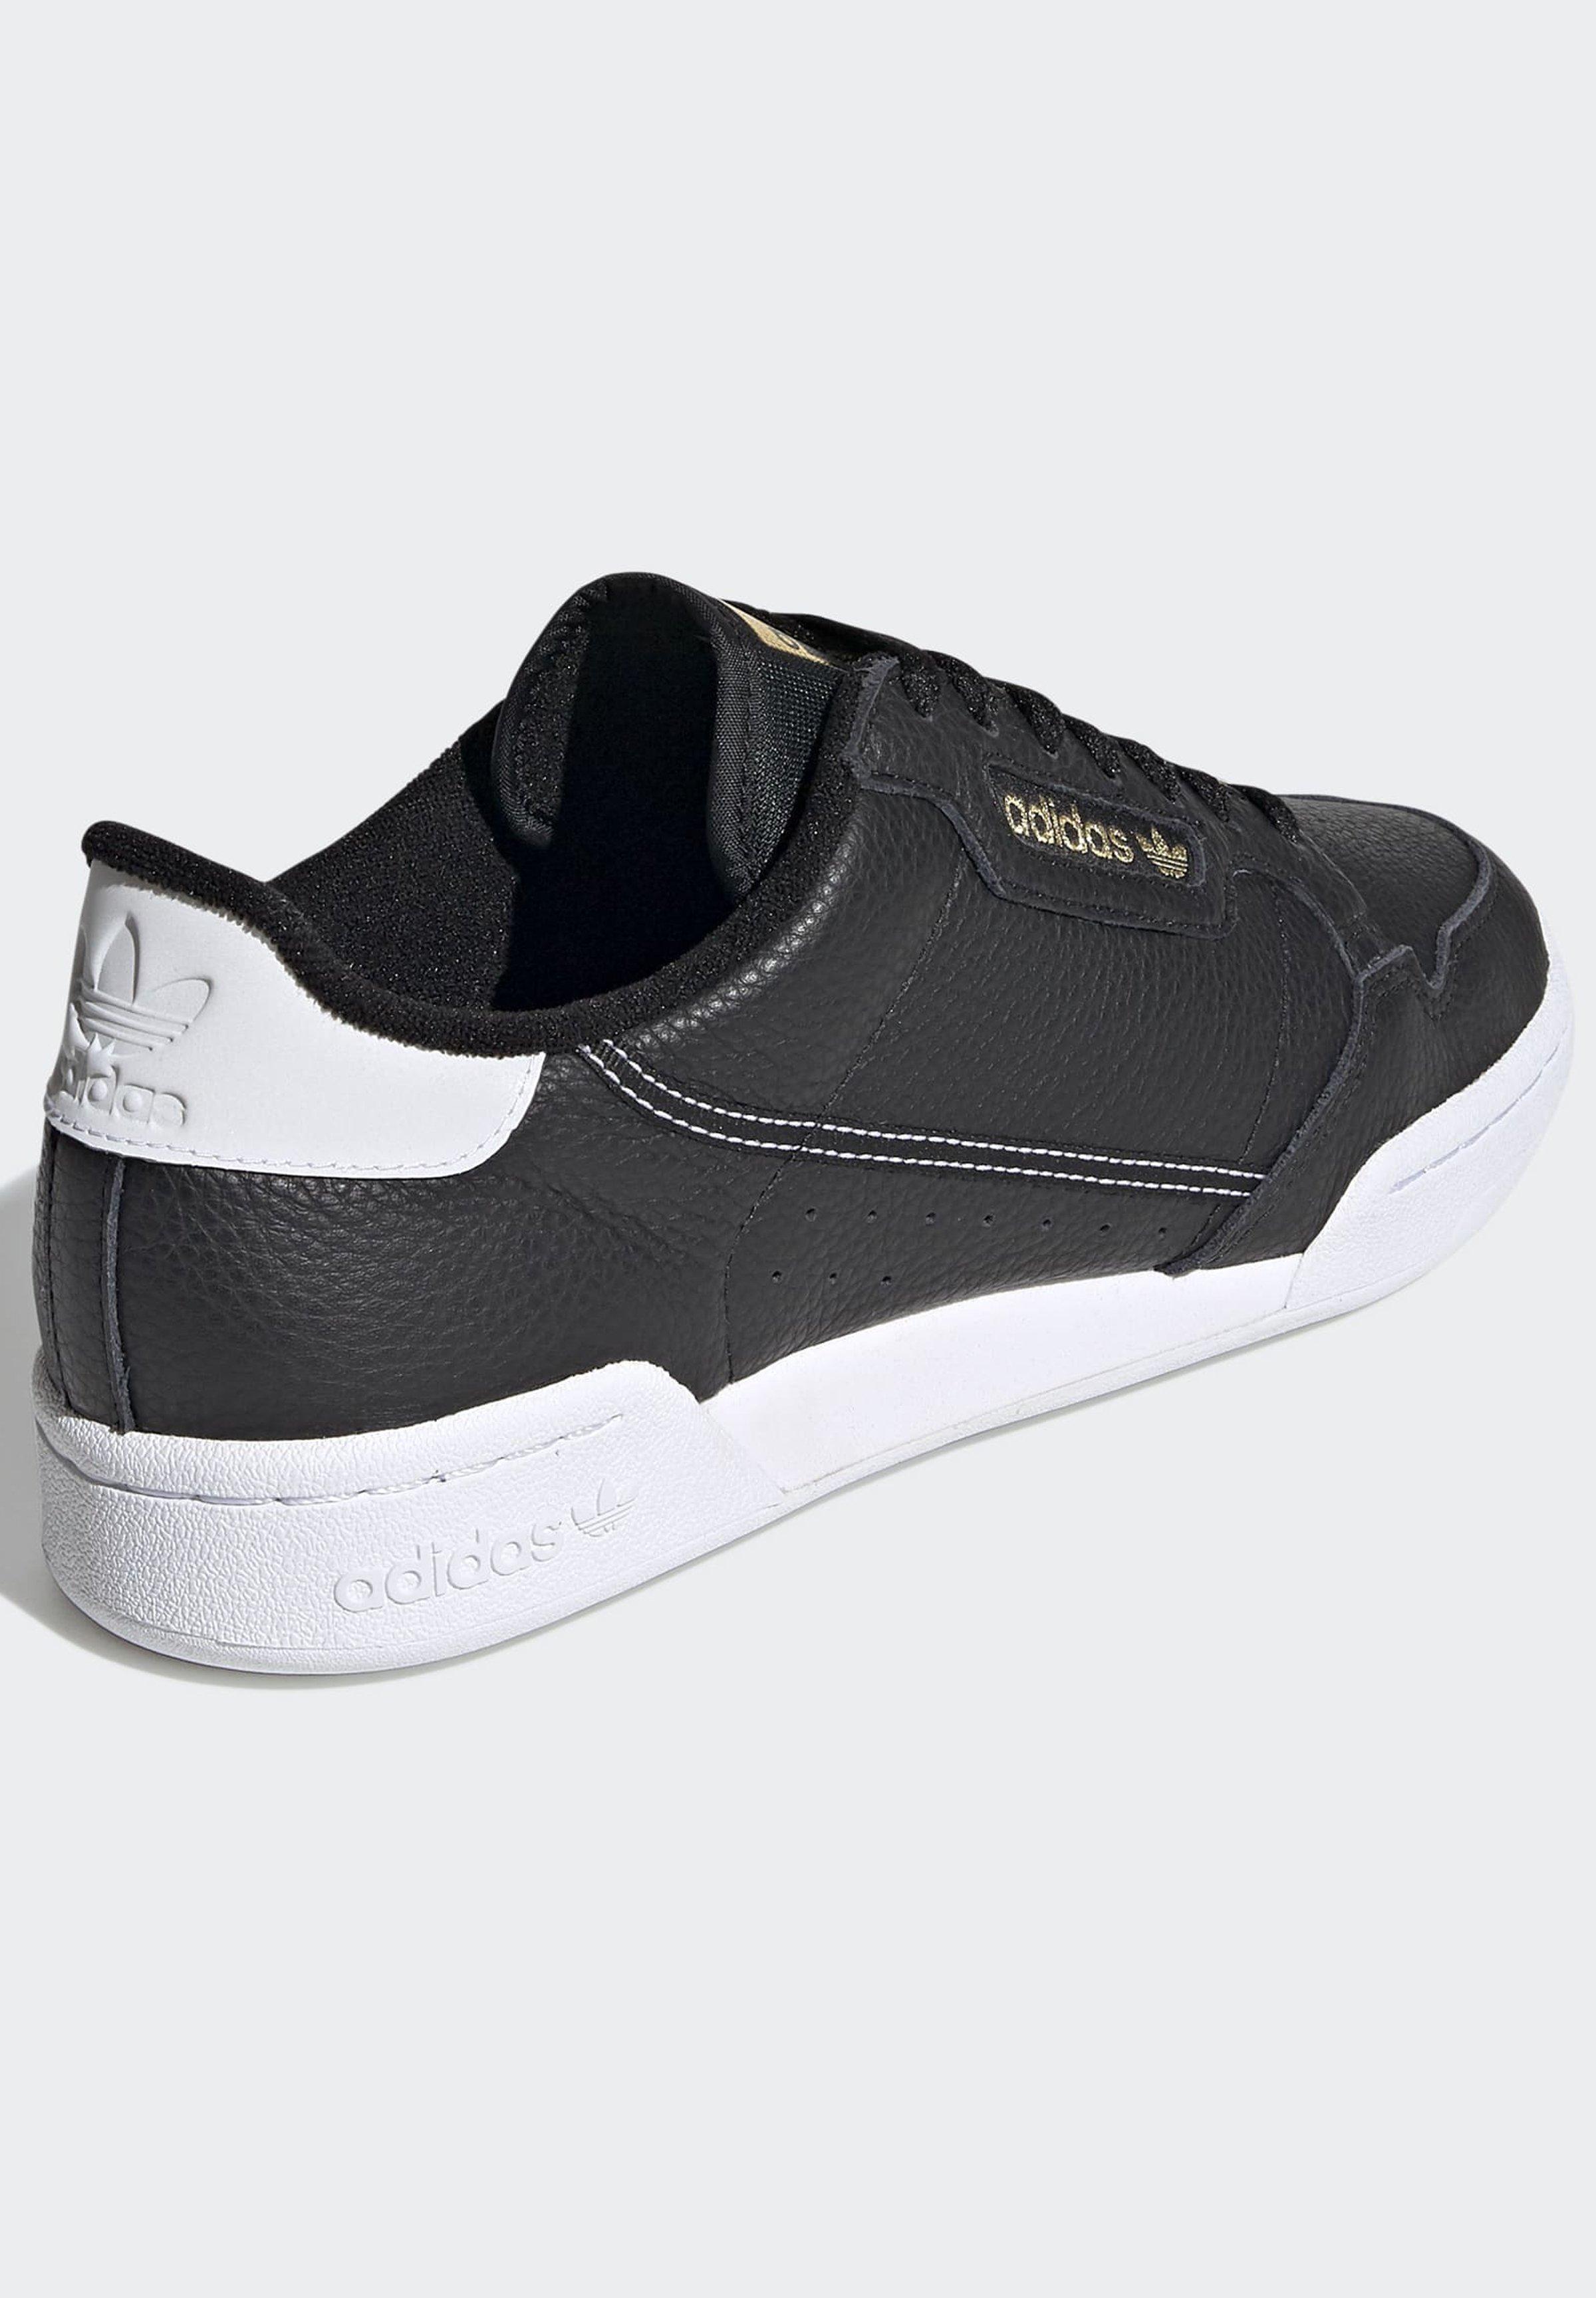 Adidas Originals Continental 80 Shoes - Sneakers Black